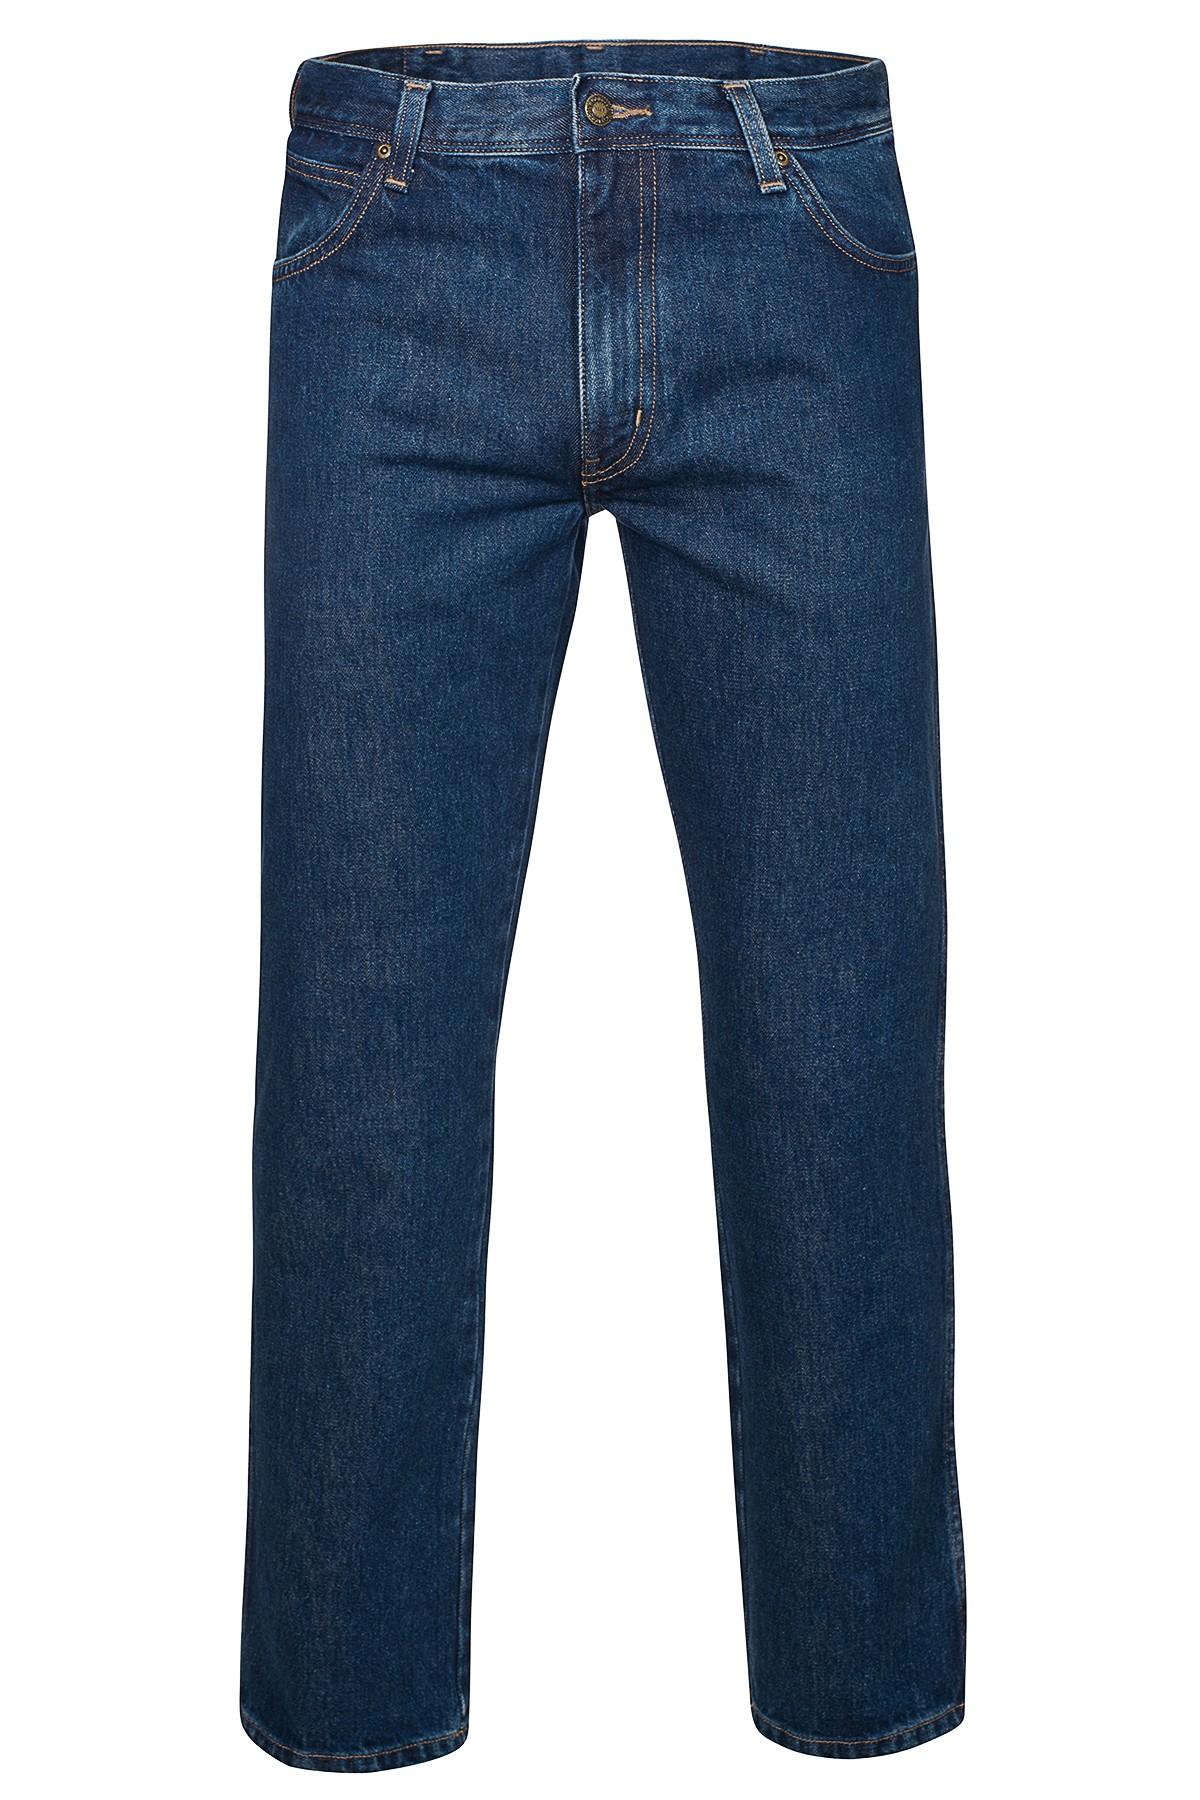 "Wrangler Jeans ""Durable"" für 14,99€ @outlet46"